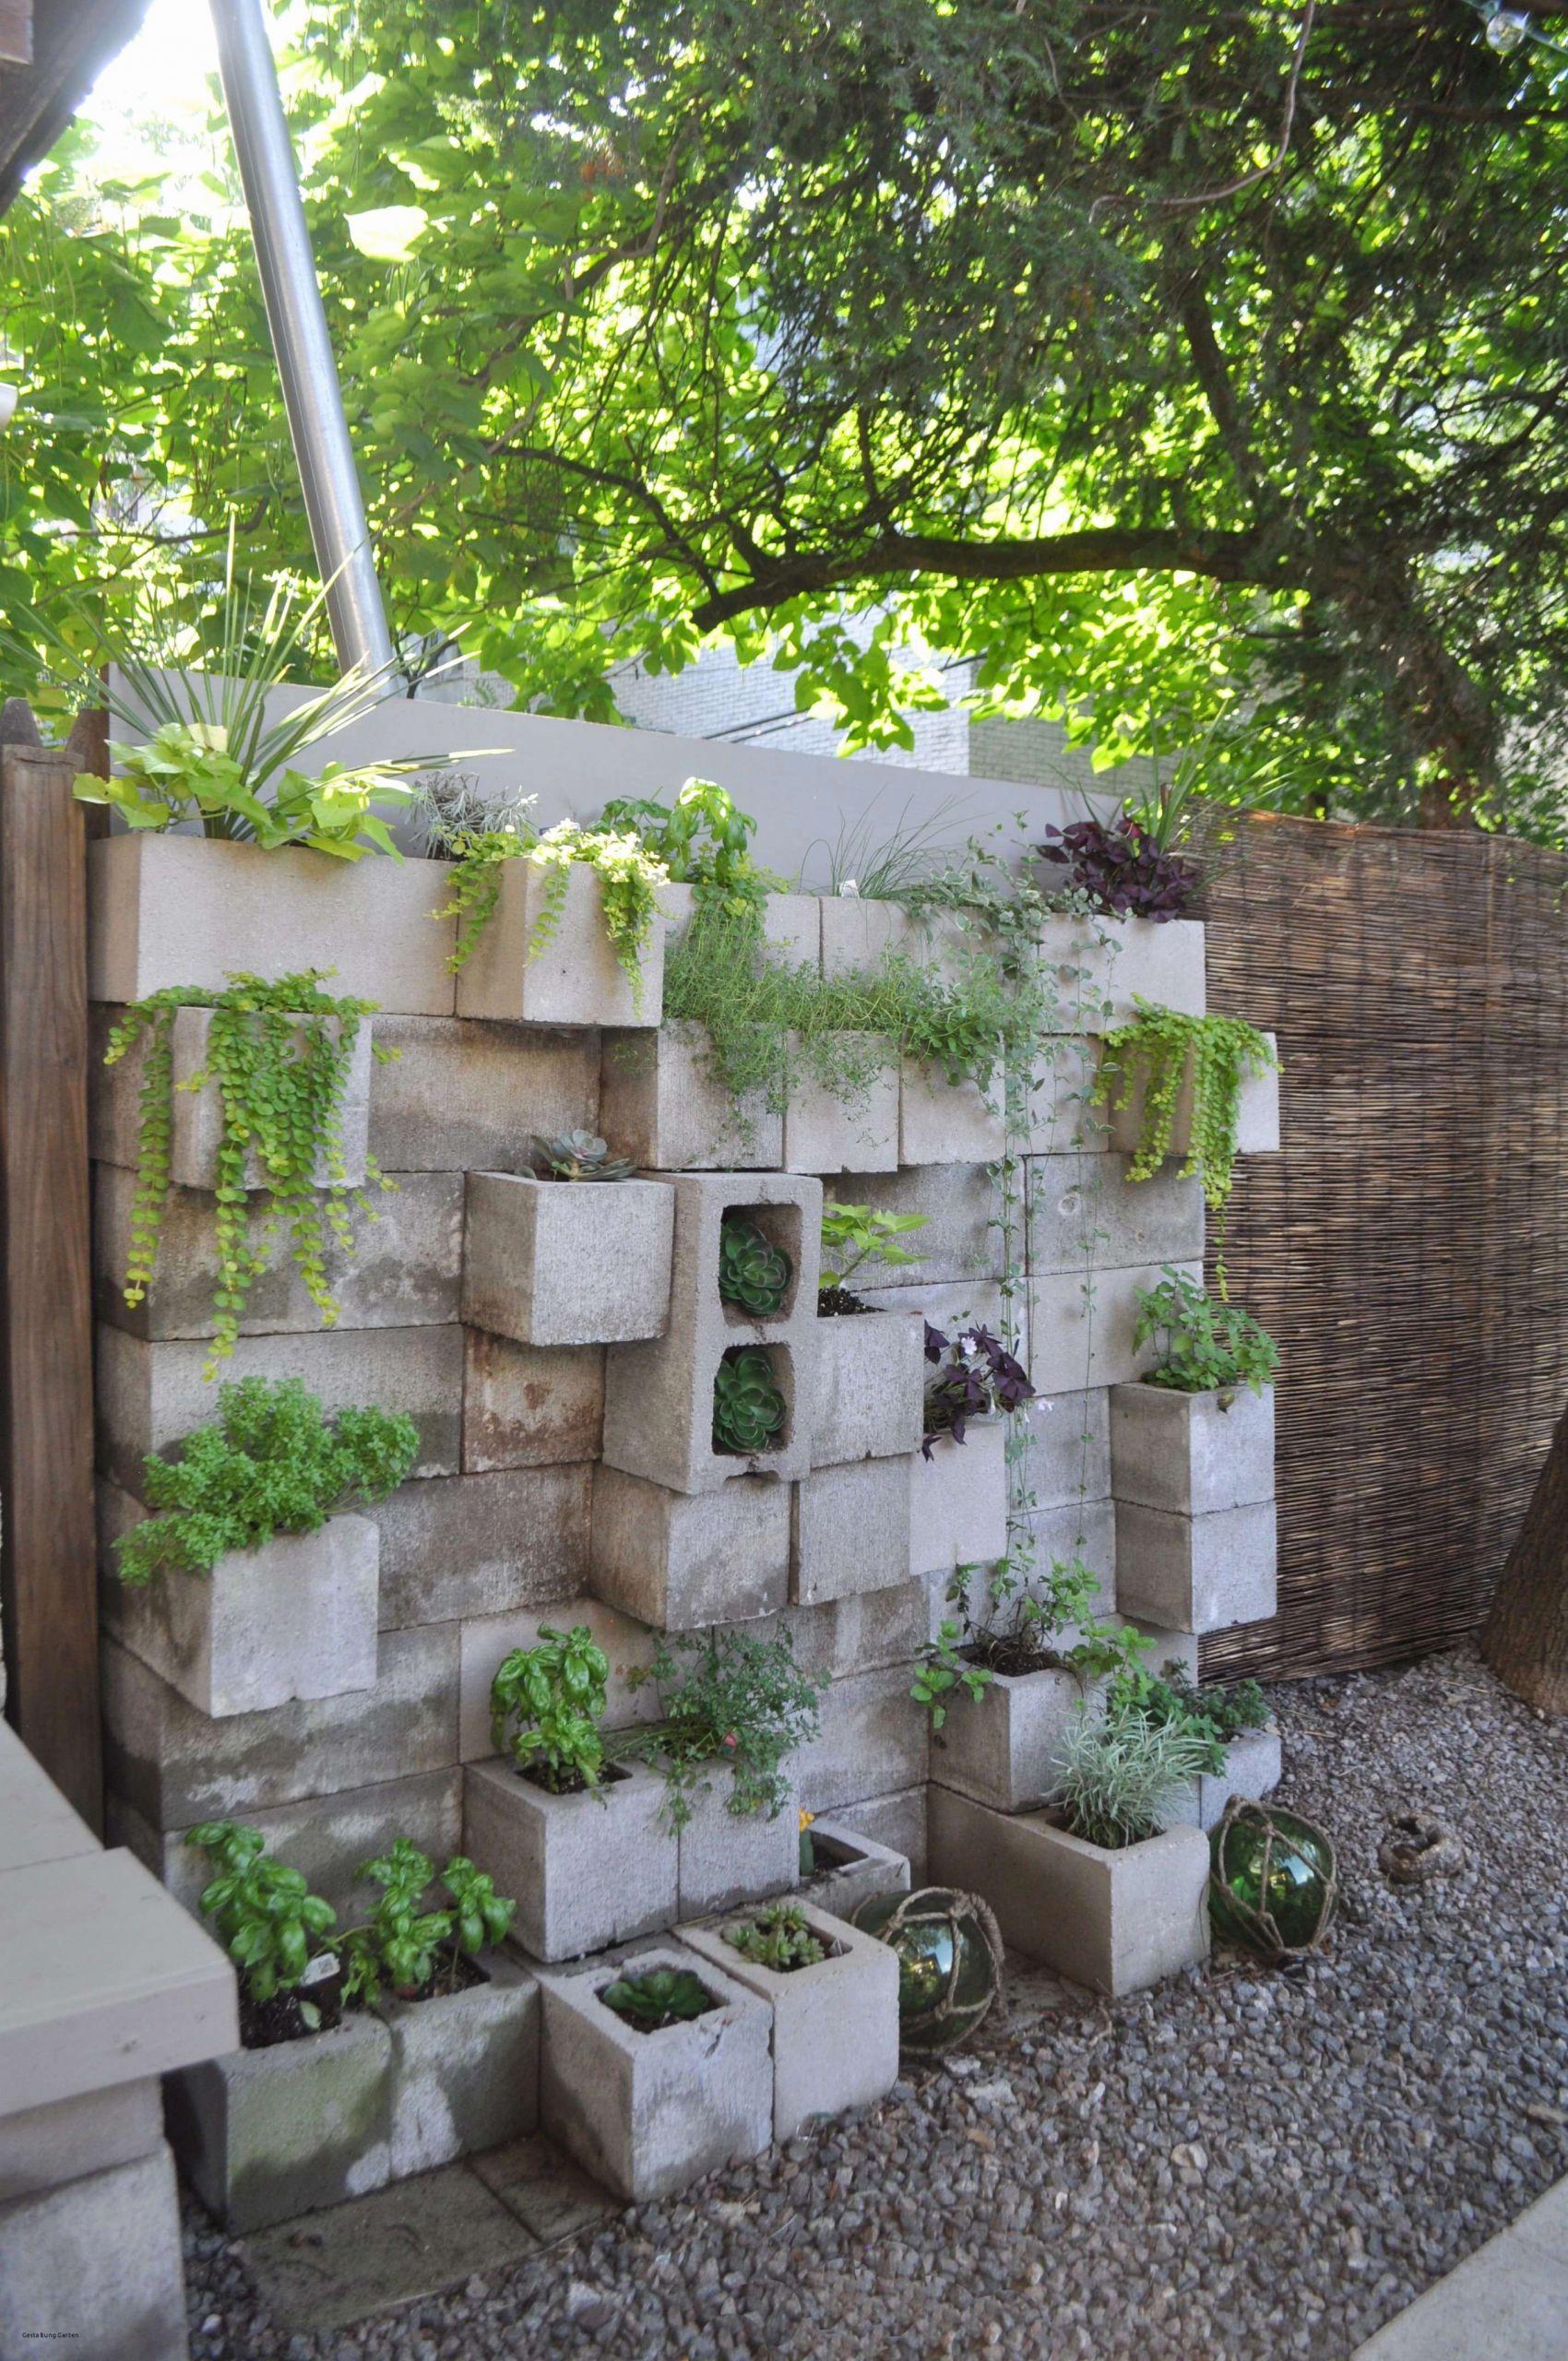 Gestaltung Garten Elegant Garten Gestalten Ideen — Temobardz Home Blog